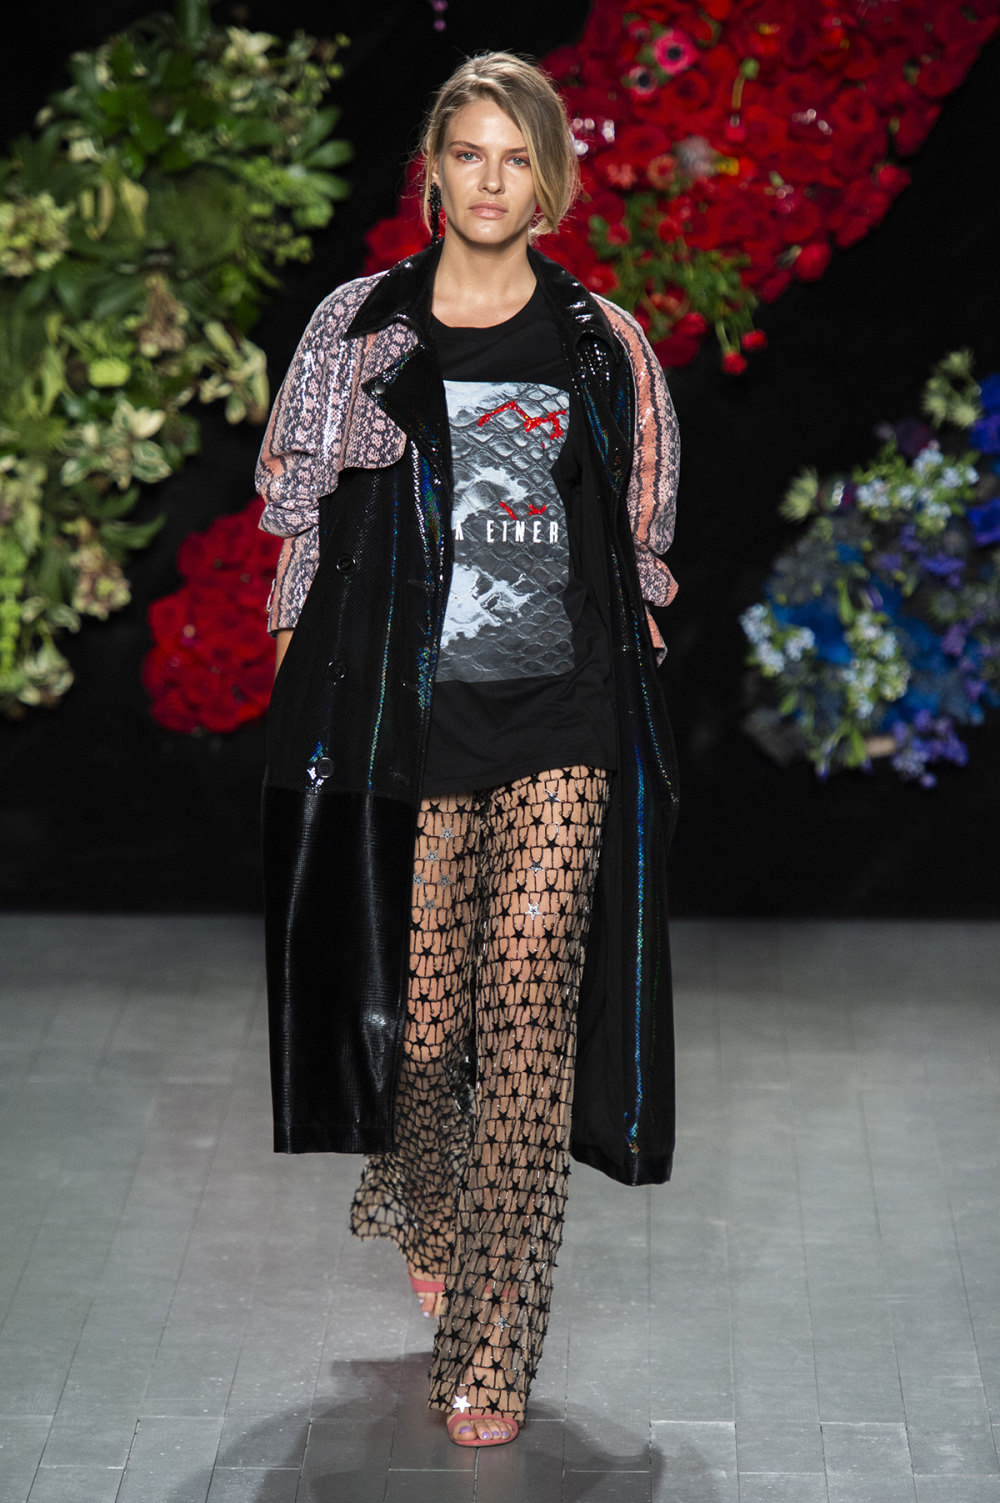 Roberta Einer时装系列格子呢西装外套收紧腰部霓虹色腰带连帽衫-7.jpg